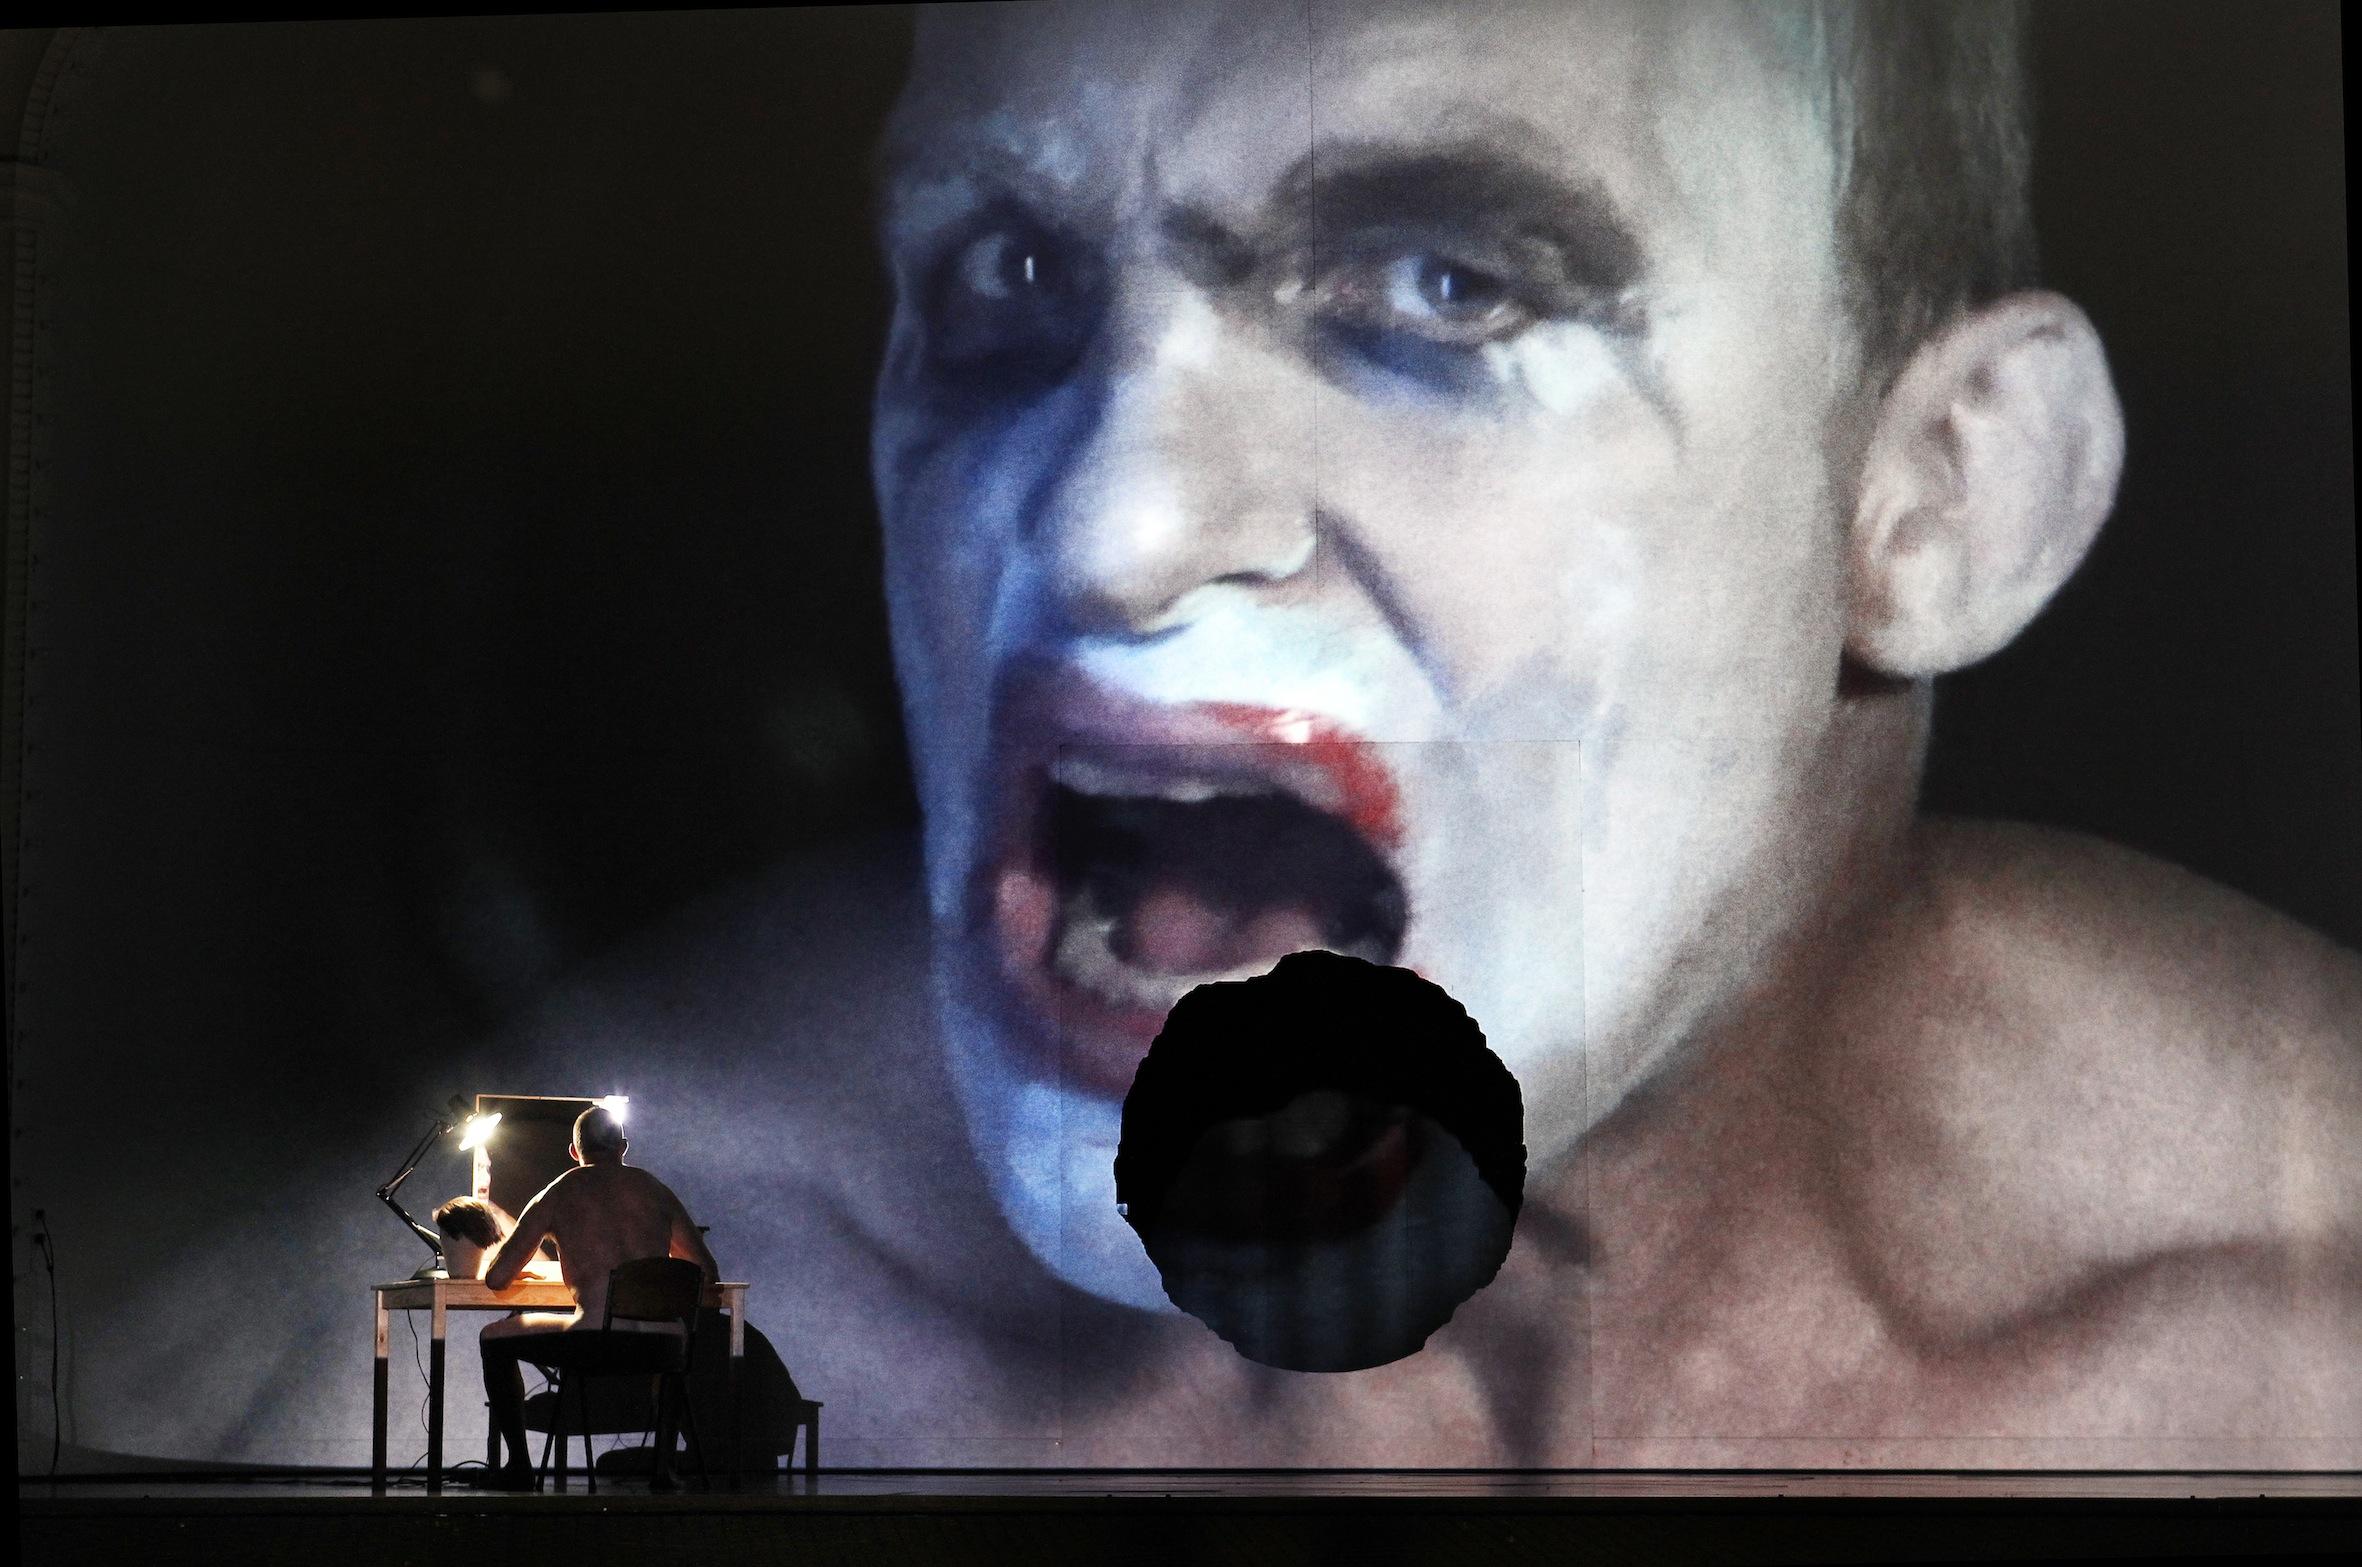 melbourne-ring-cycle-opera-australia-2013-siegfried-jud-arthur-as-fafner.jpg